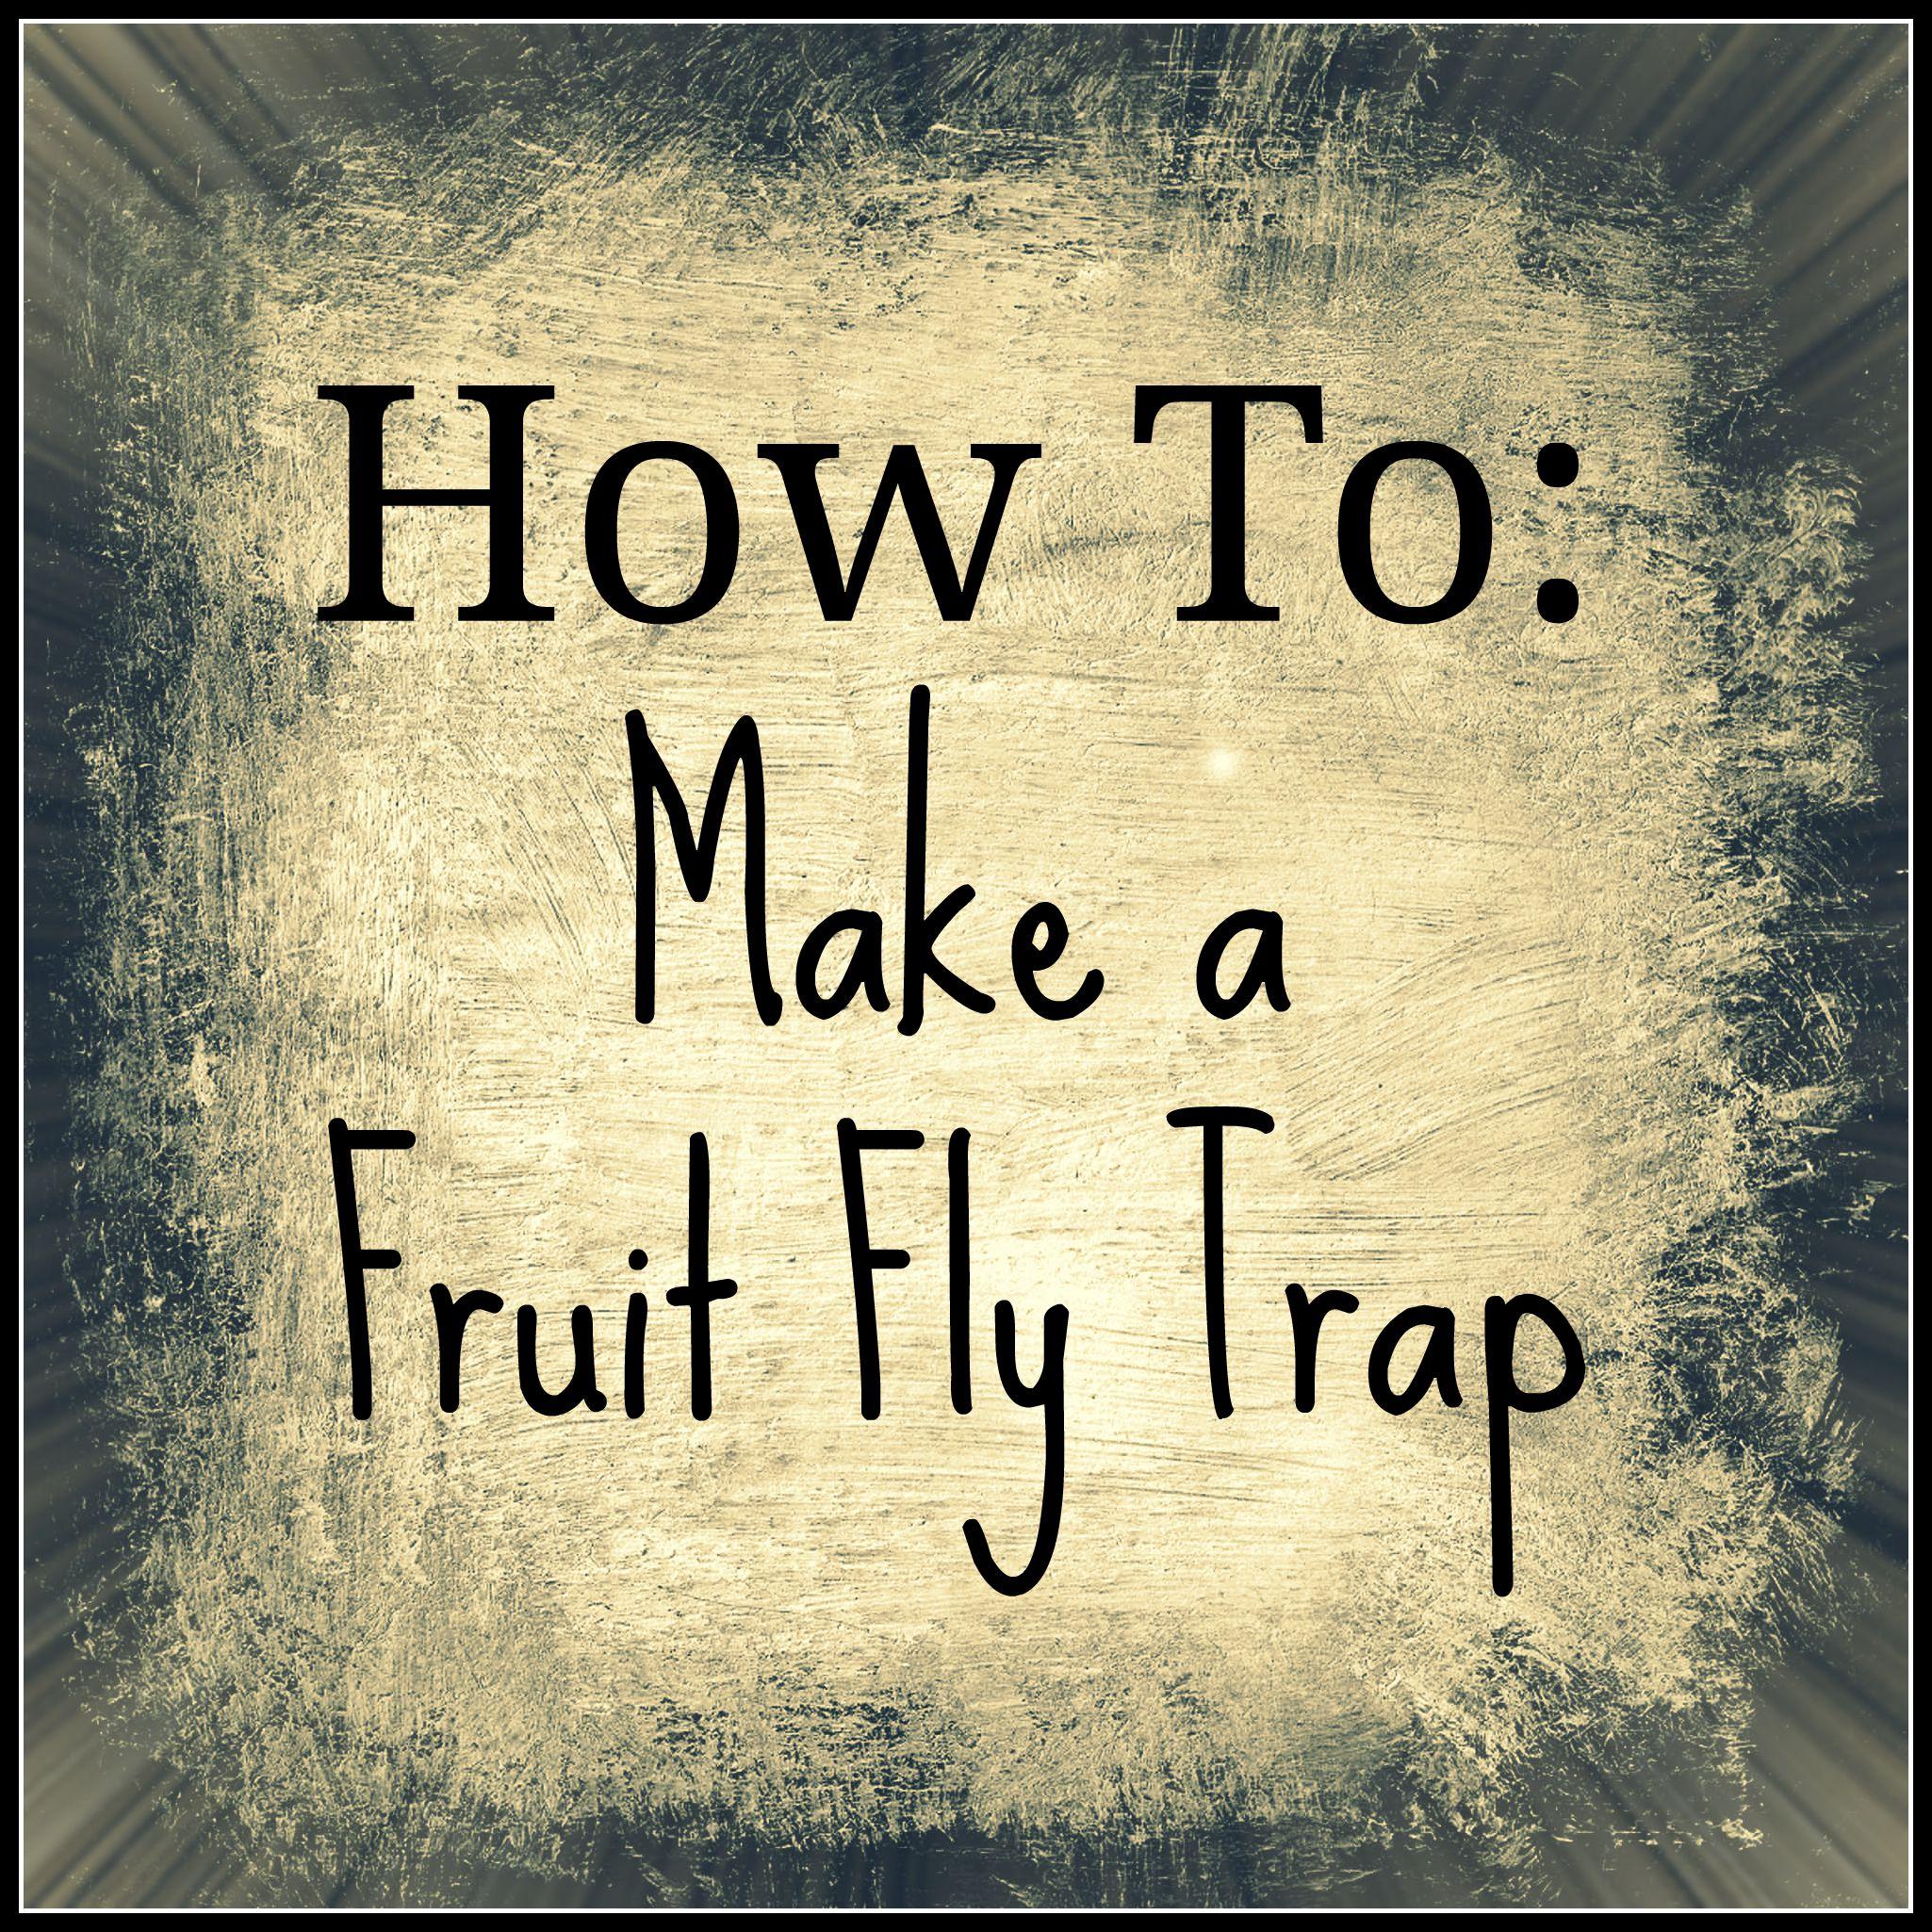 fruitflytrap